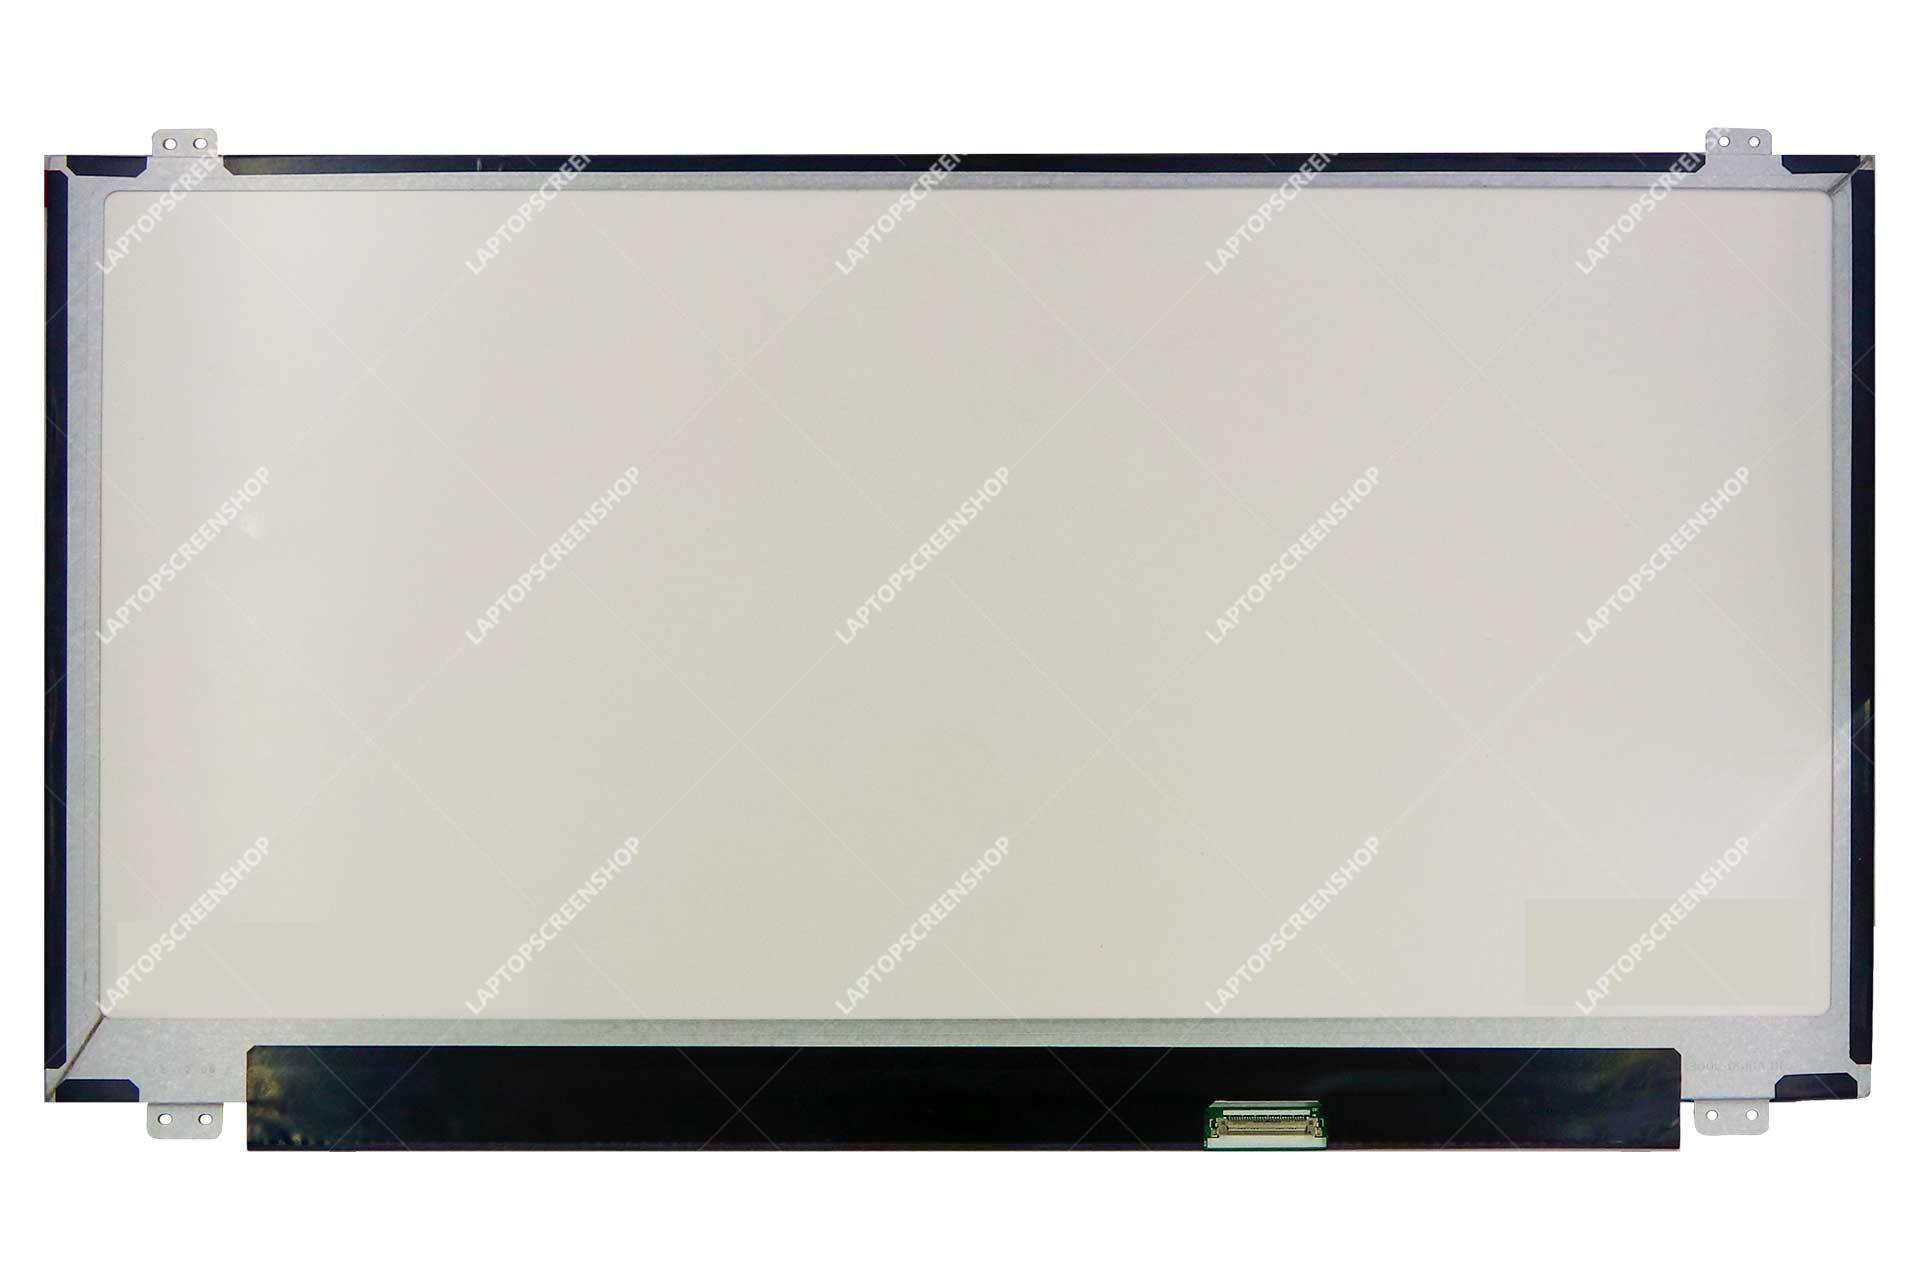 ACER-ASPIRE-E1-410-29202G50MNKK-LCD-LCD |HD|فروشگاه لپ تاپ اسکرين | تعمير لپ تاپ